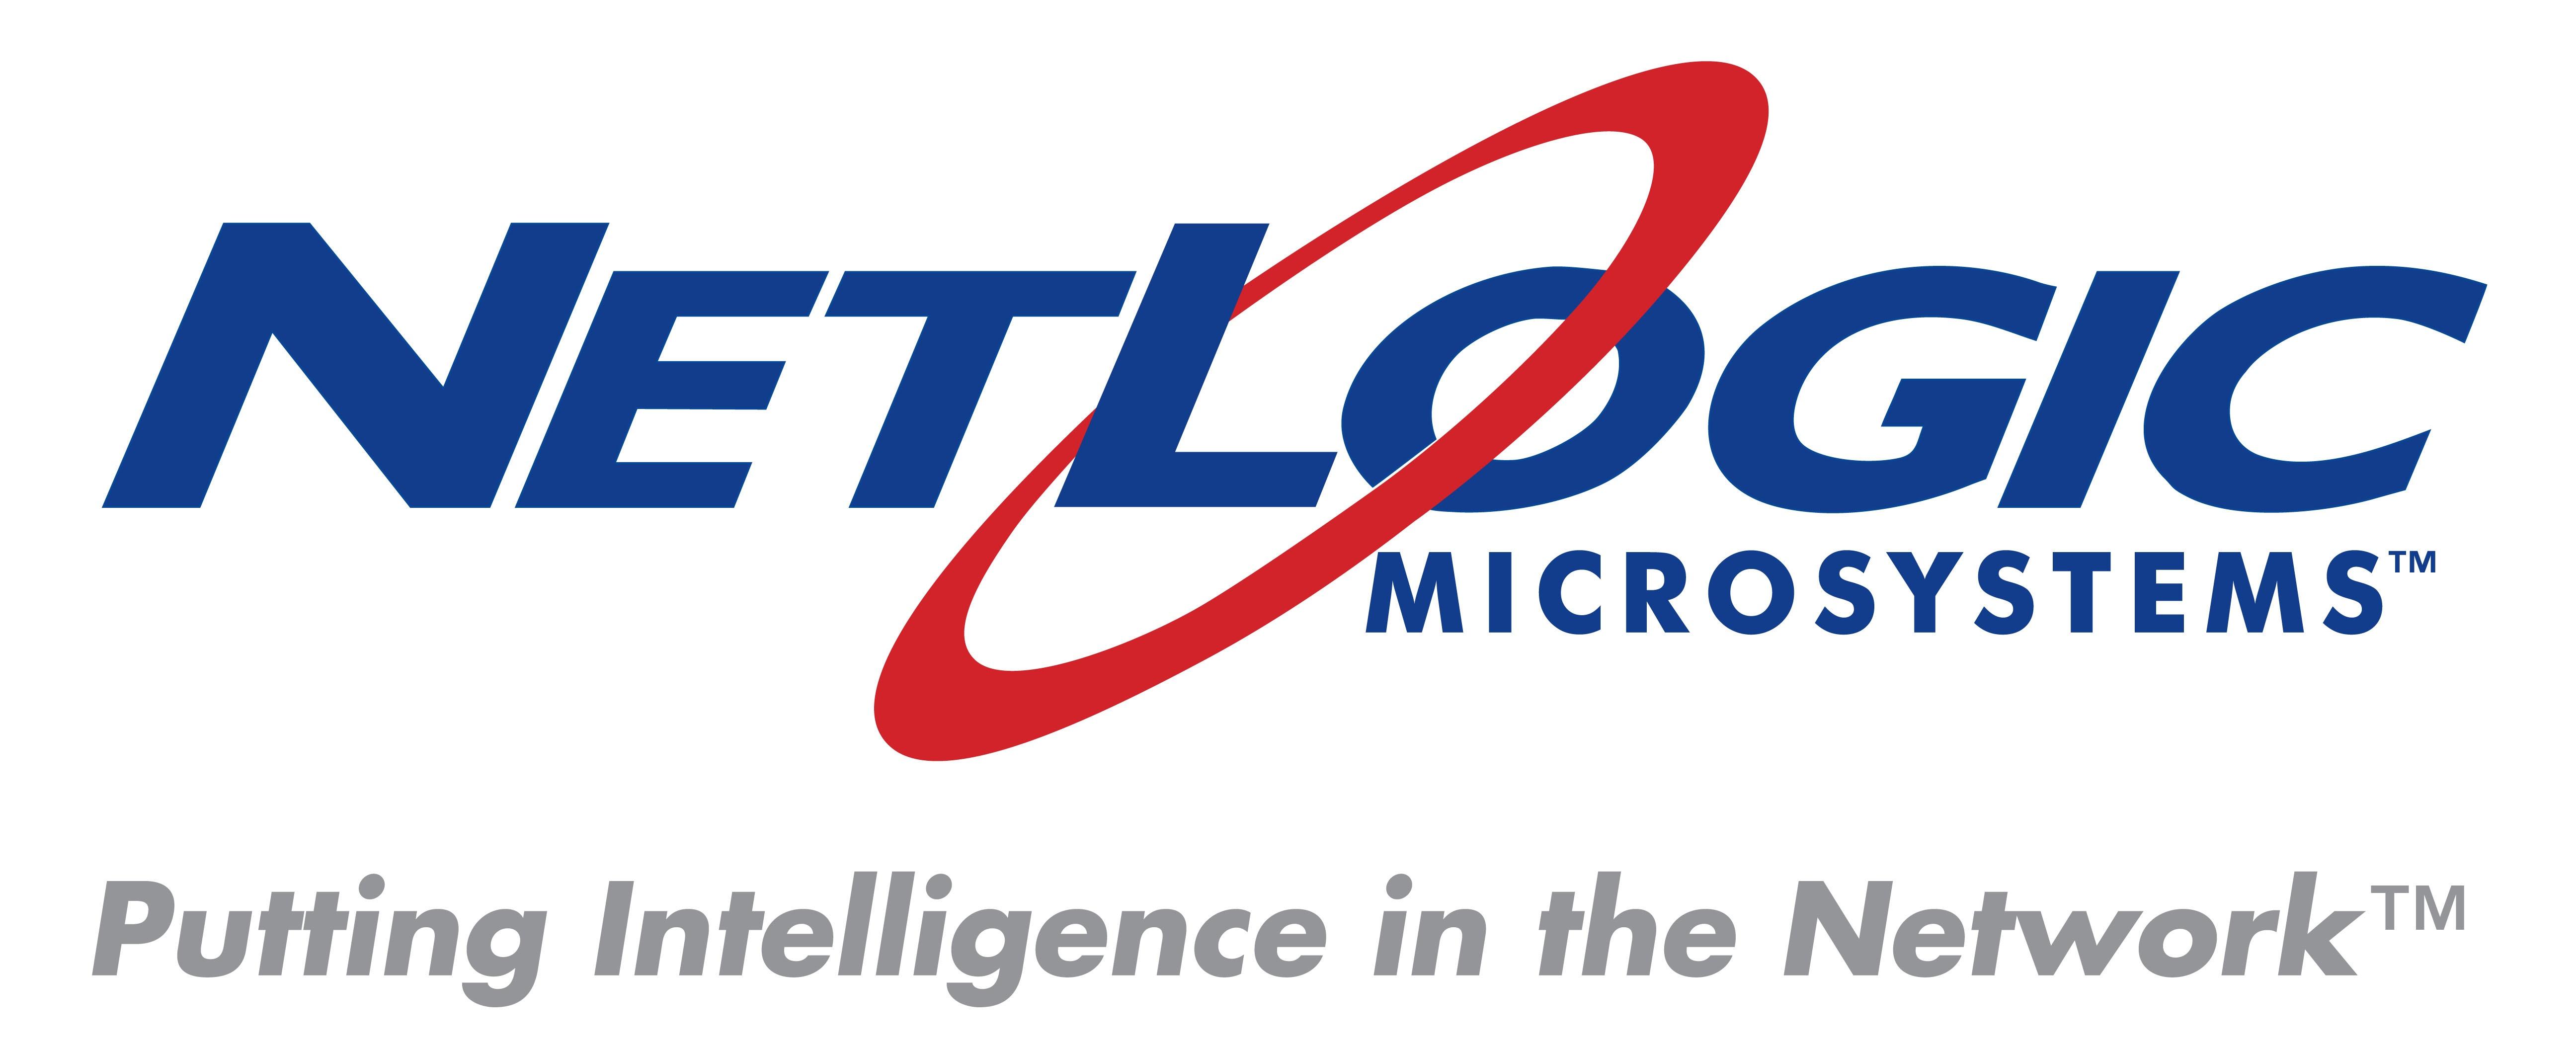 NetLogic Microsystems logo